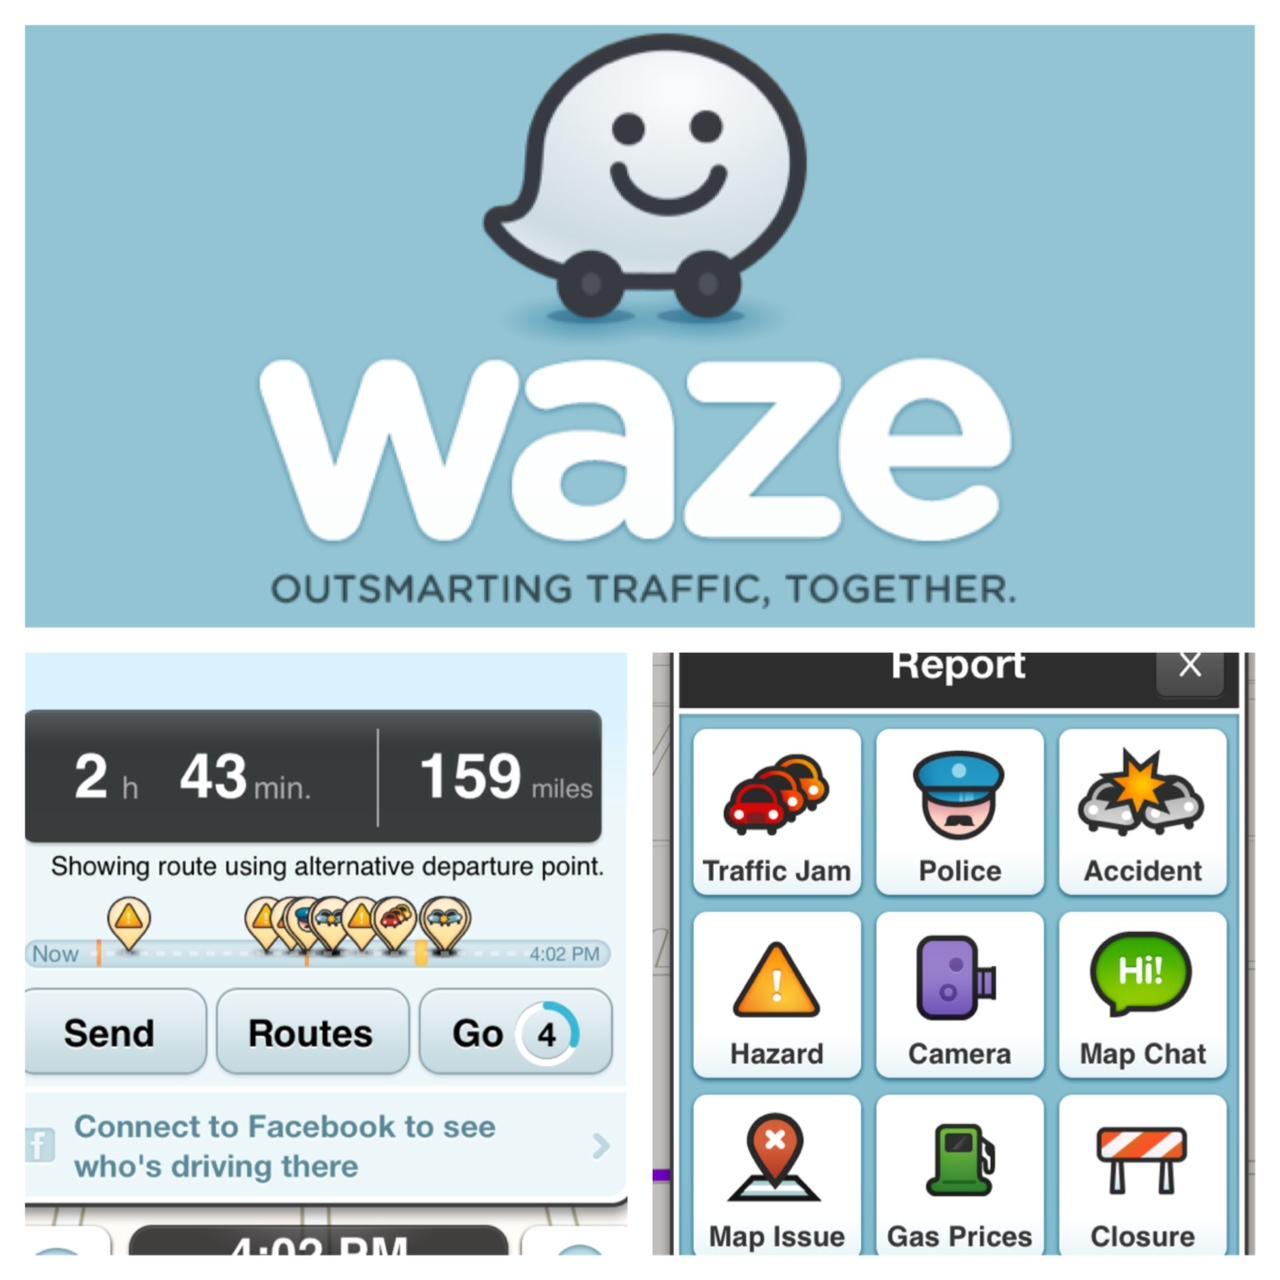 wave app image